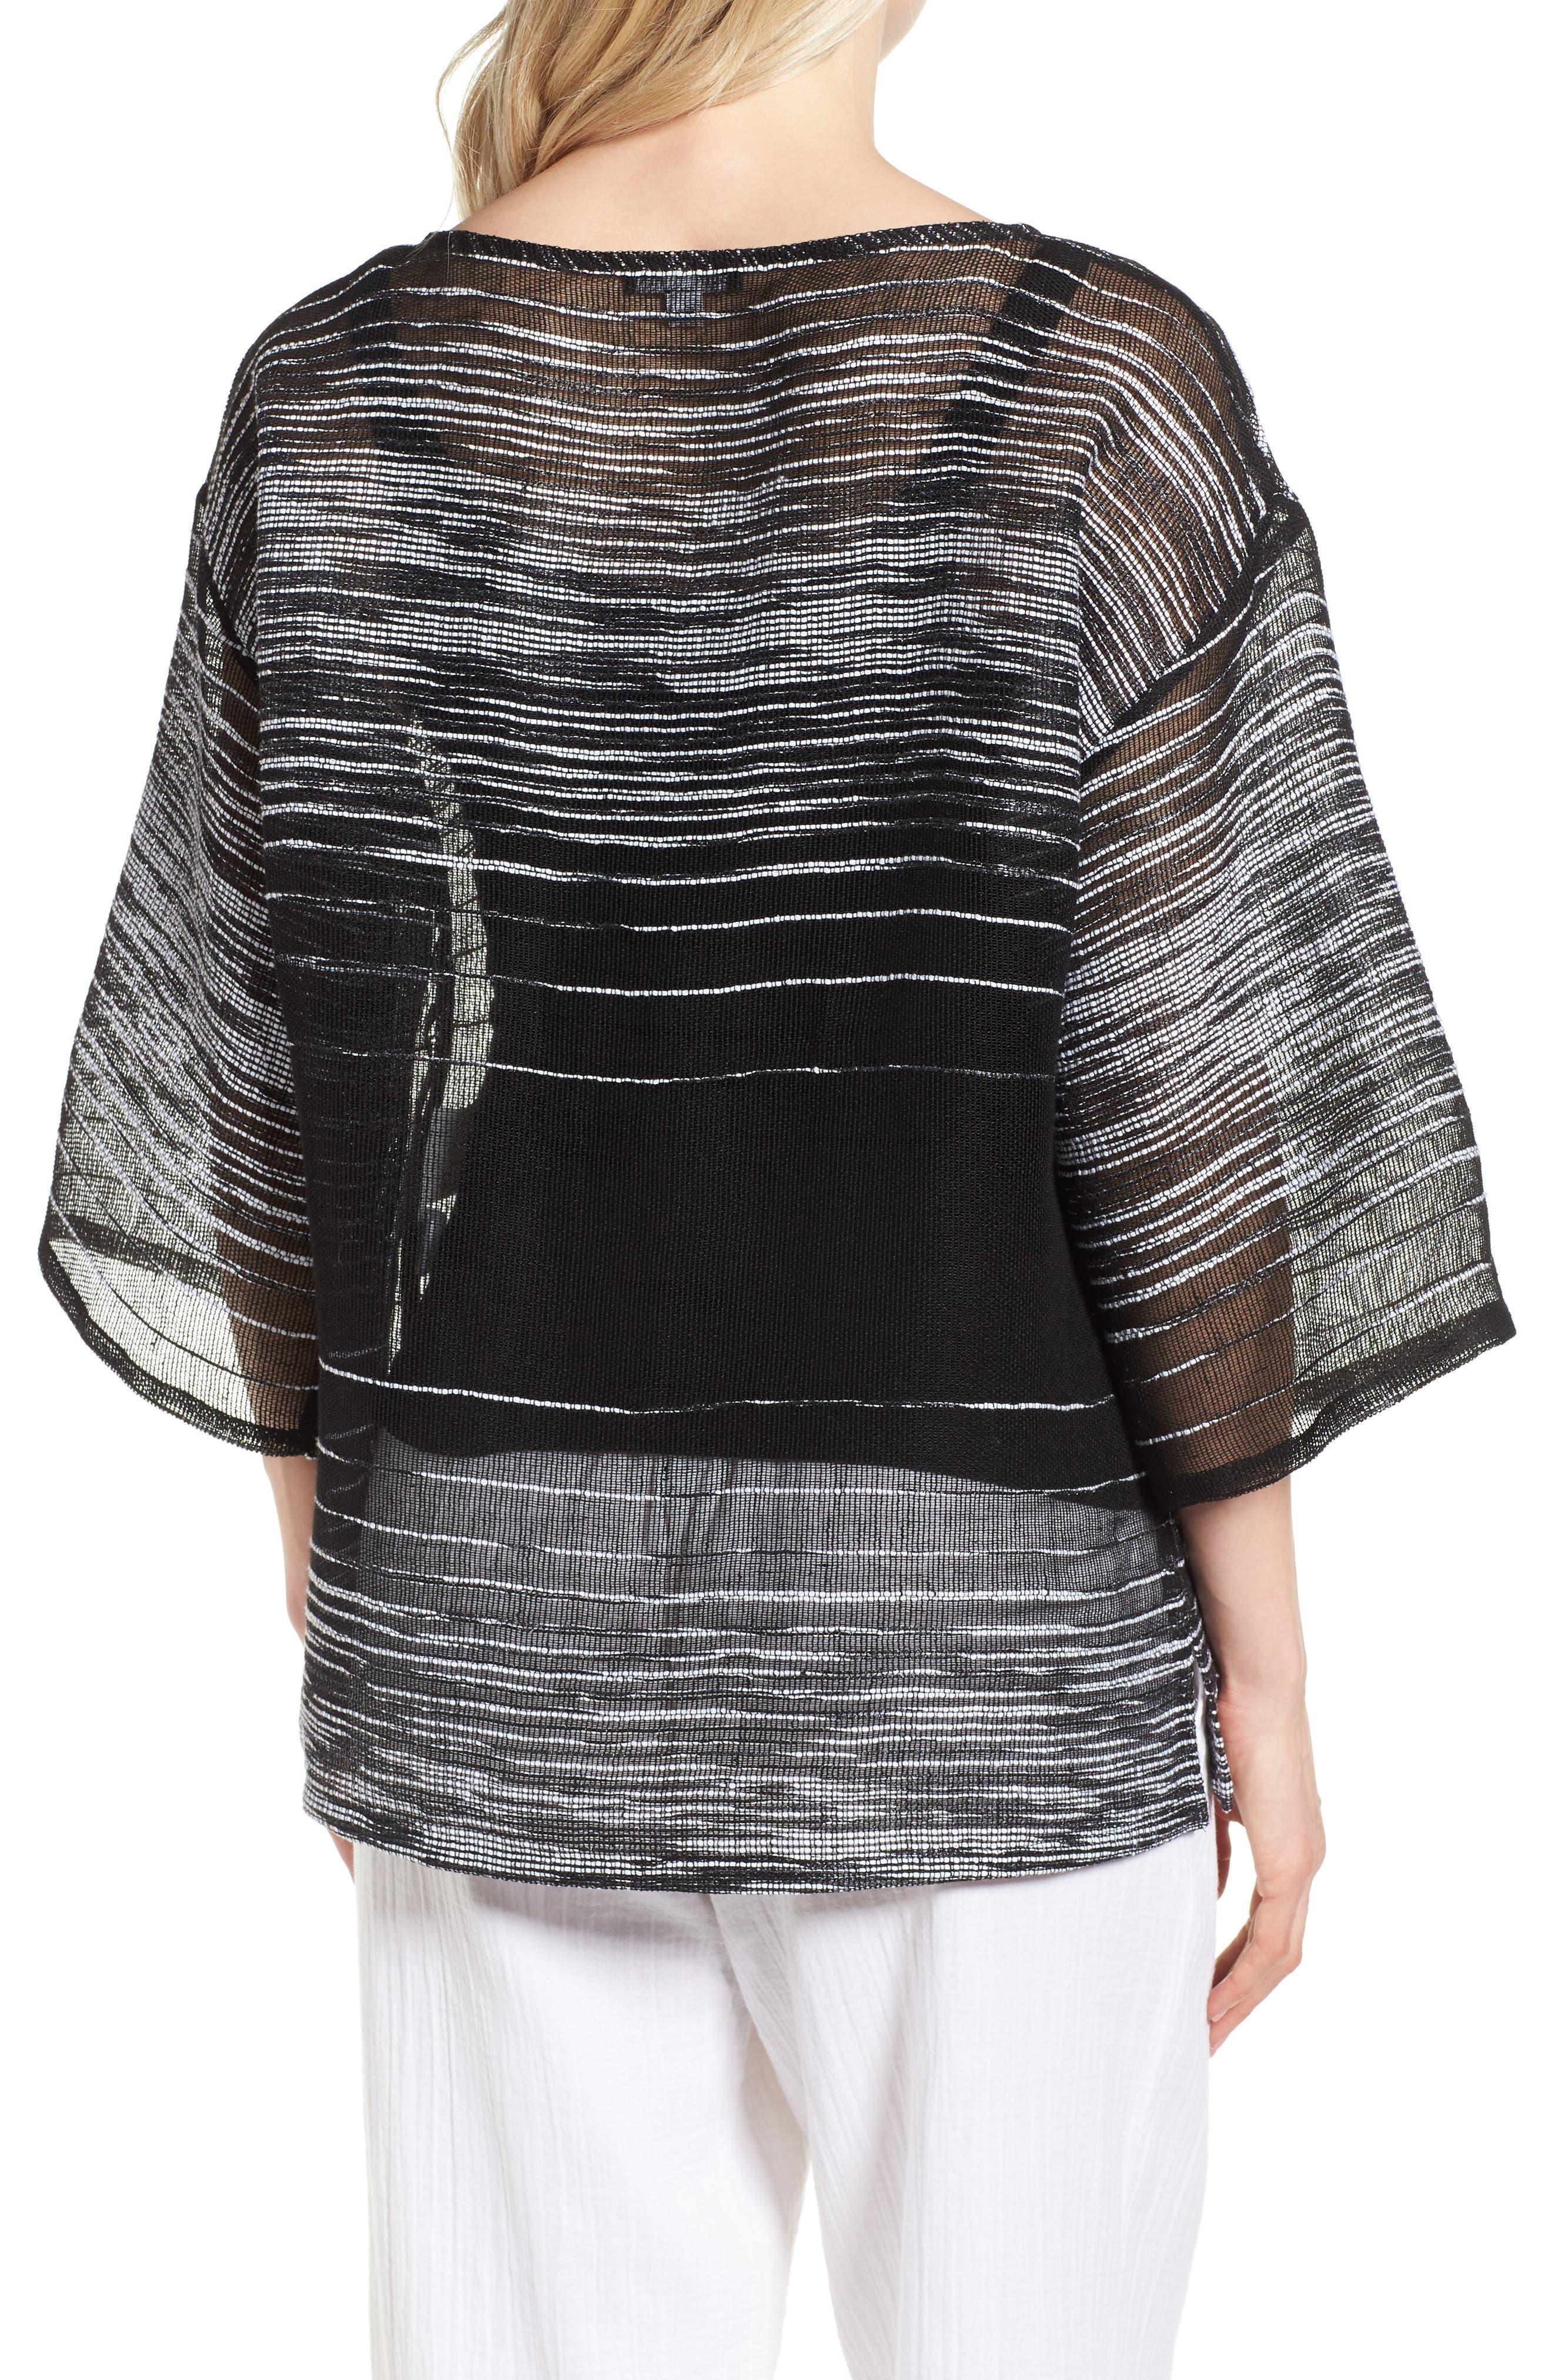 Organic Linen Blend Top,                             Alternate thumbnail 2, color,                             Black